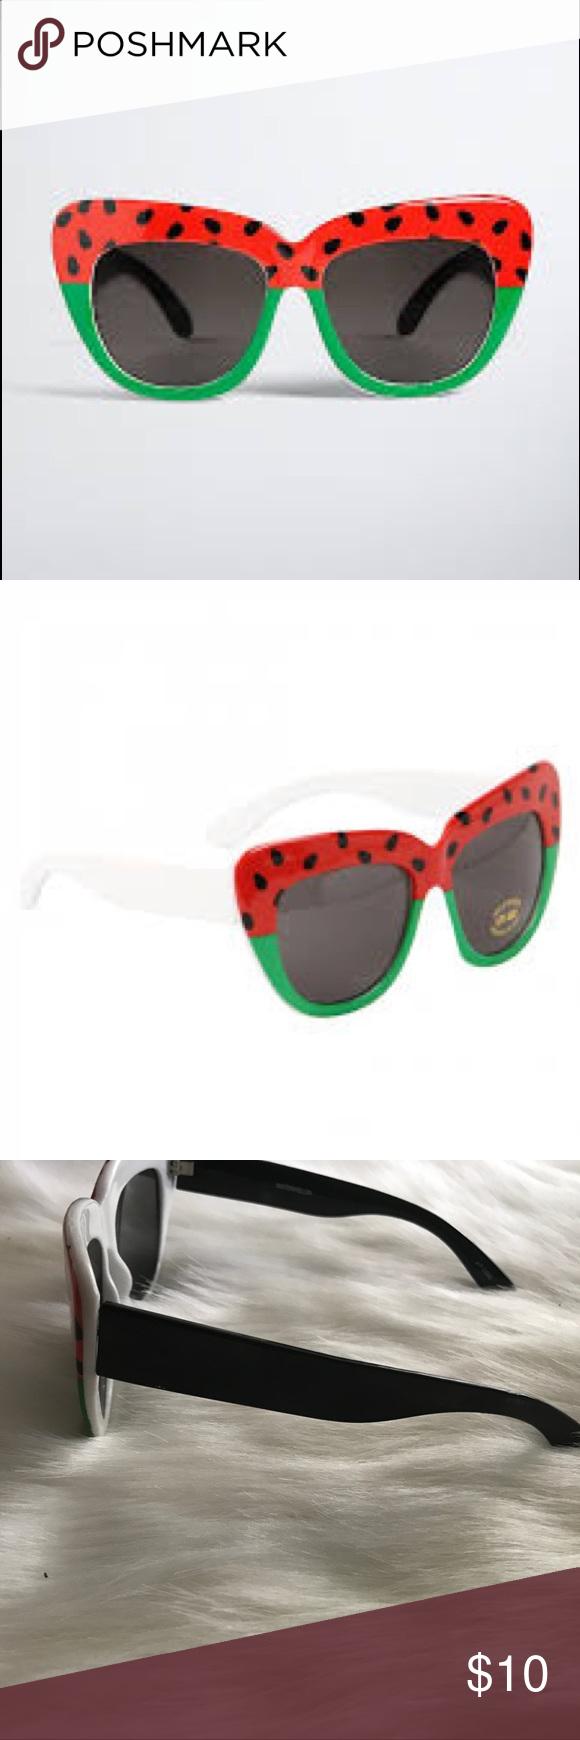 2e2f25694eff8 🍉Watermelon Sunglasses 🍉 Fun and cute watermelon sunglasses by Torrid😍😍😍  ✨Frame